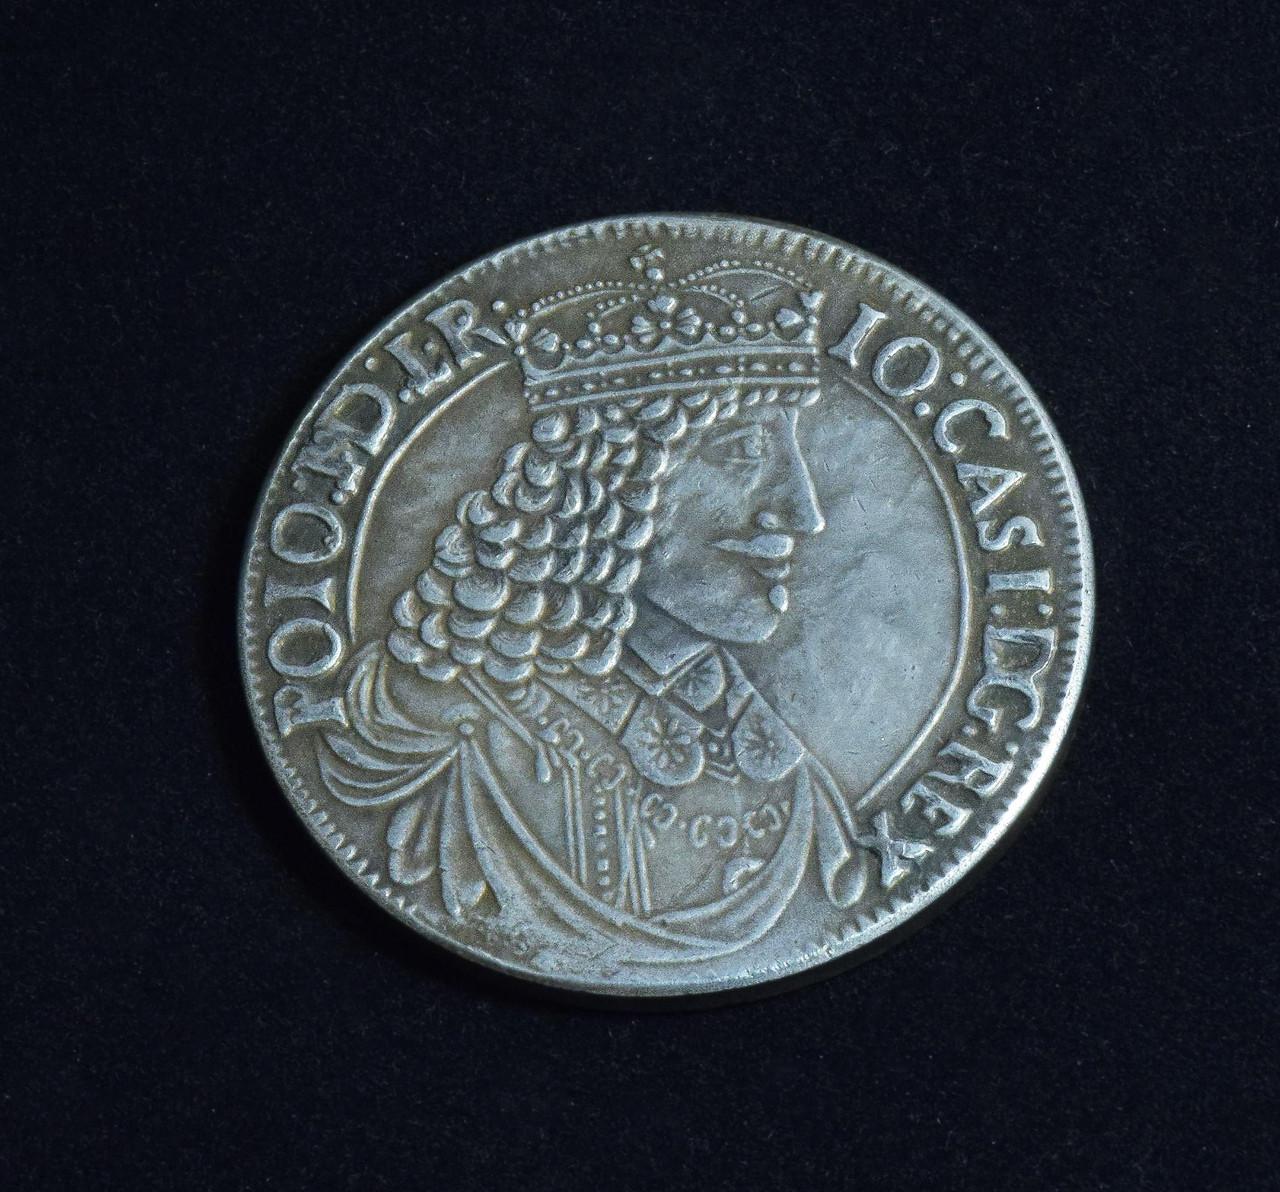 монета 5 рублей 2012 лейпцигское сражение цена